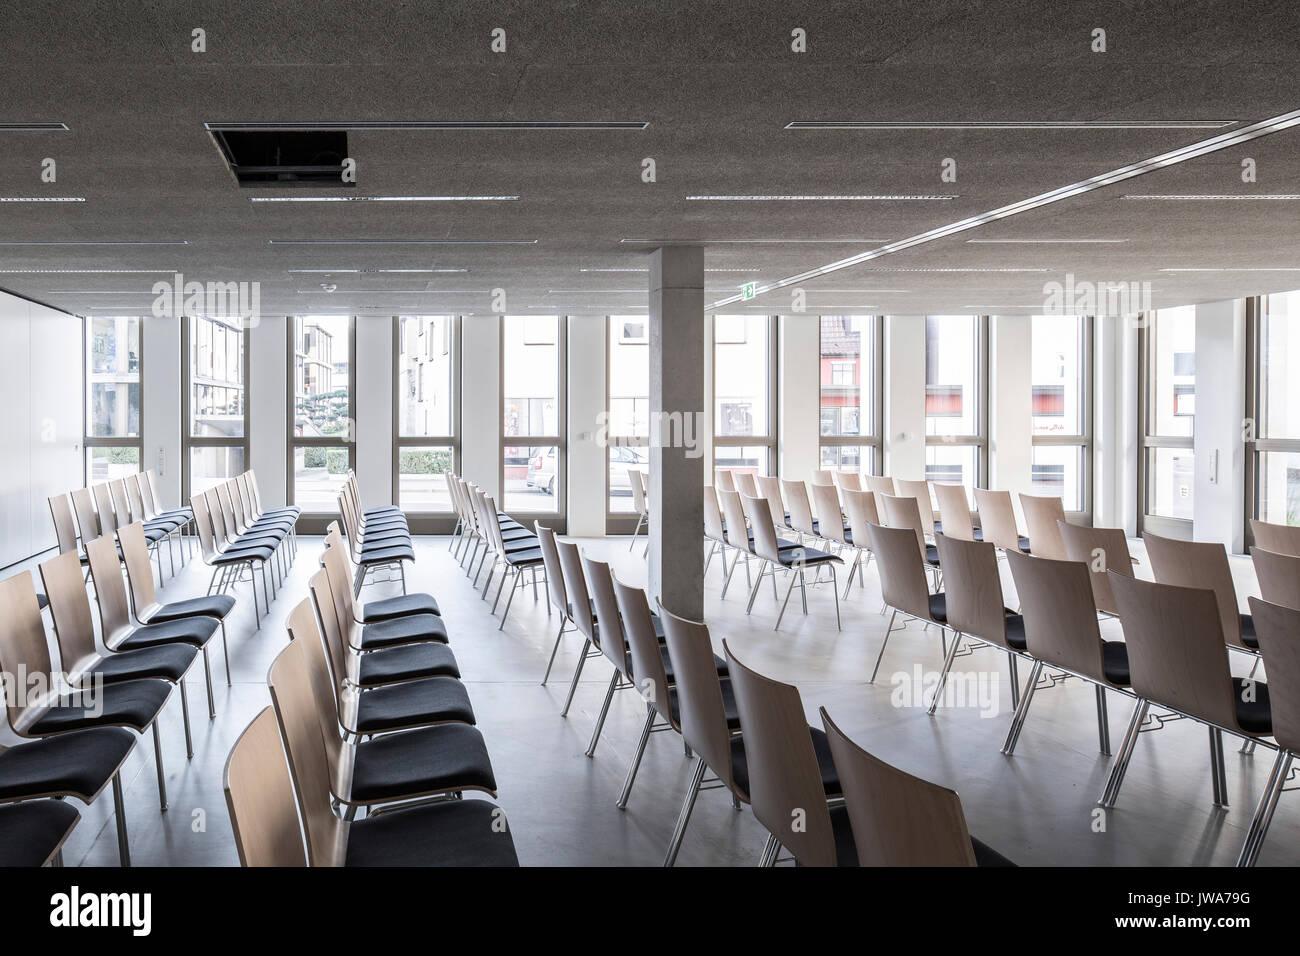 Architekten Biberach meeting room finanzamt finance office biberach biberach germany